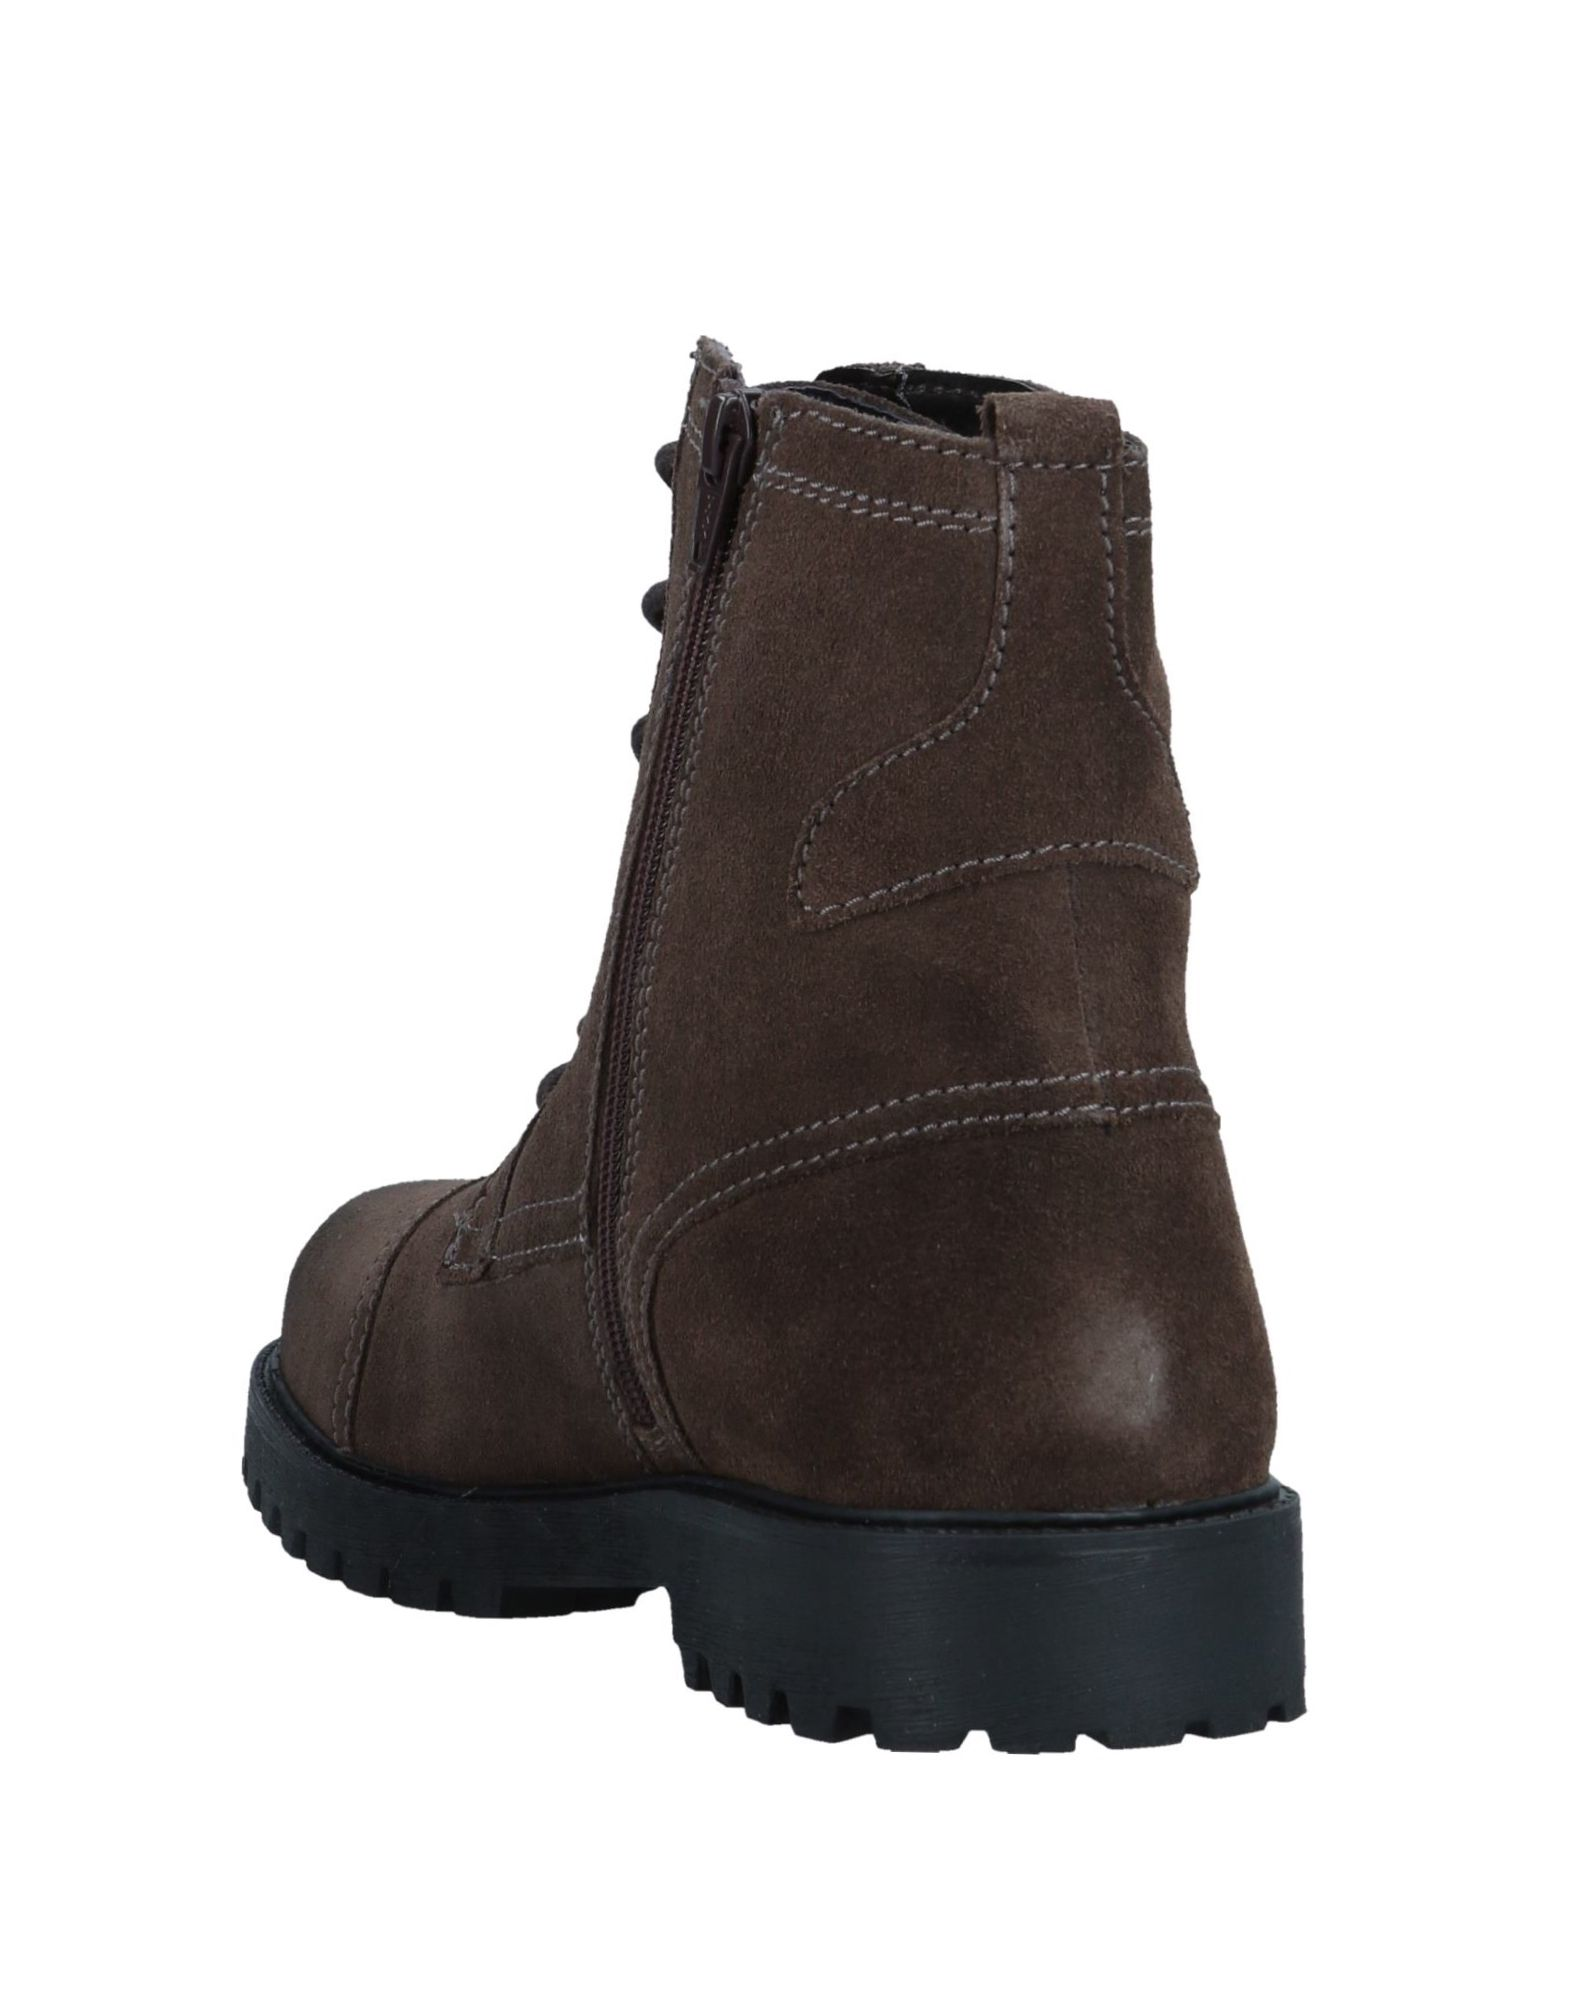 Stivaletti Uomo Lumberjack Uomo Stivaletti - 11589783EM 6df296